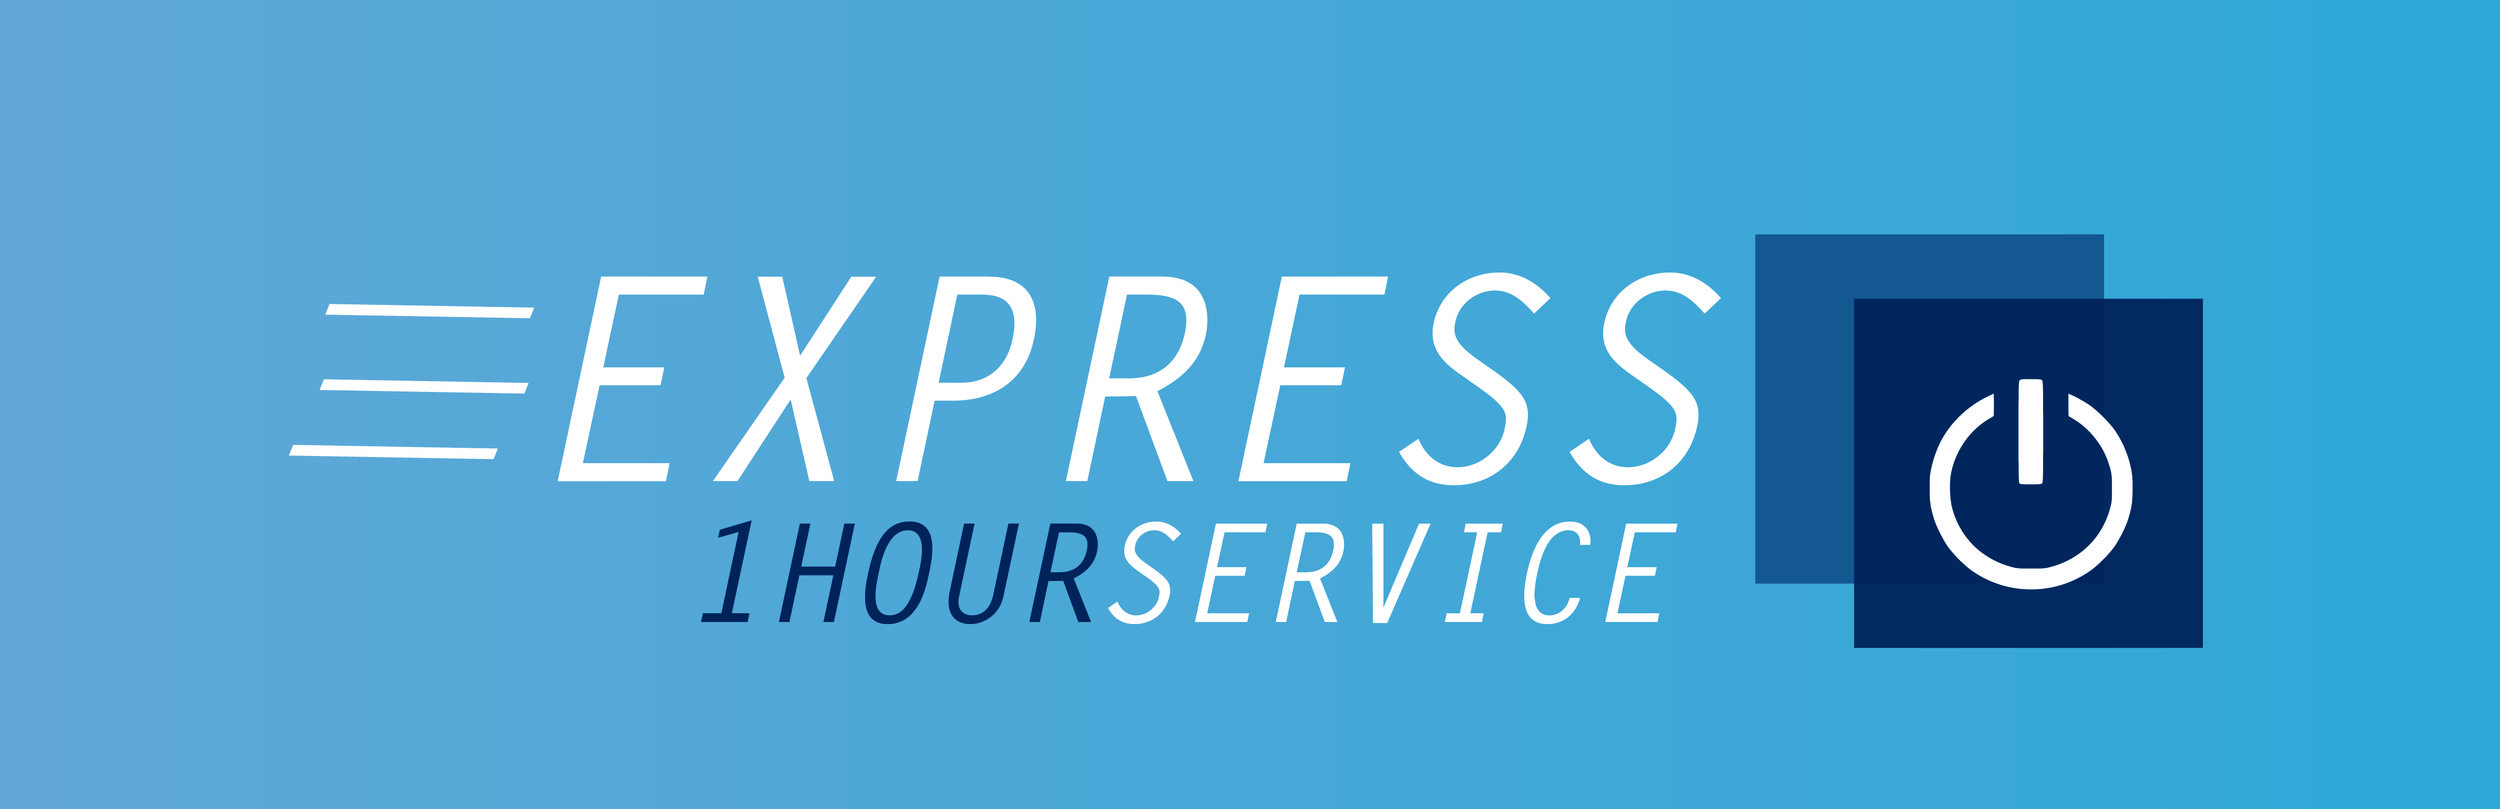 Express Service [833247].jpg